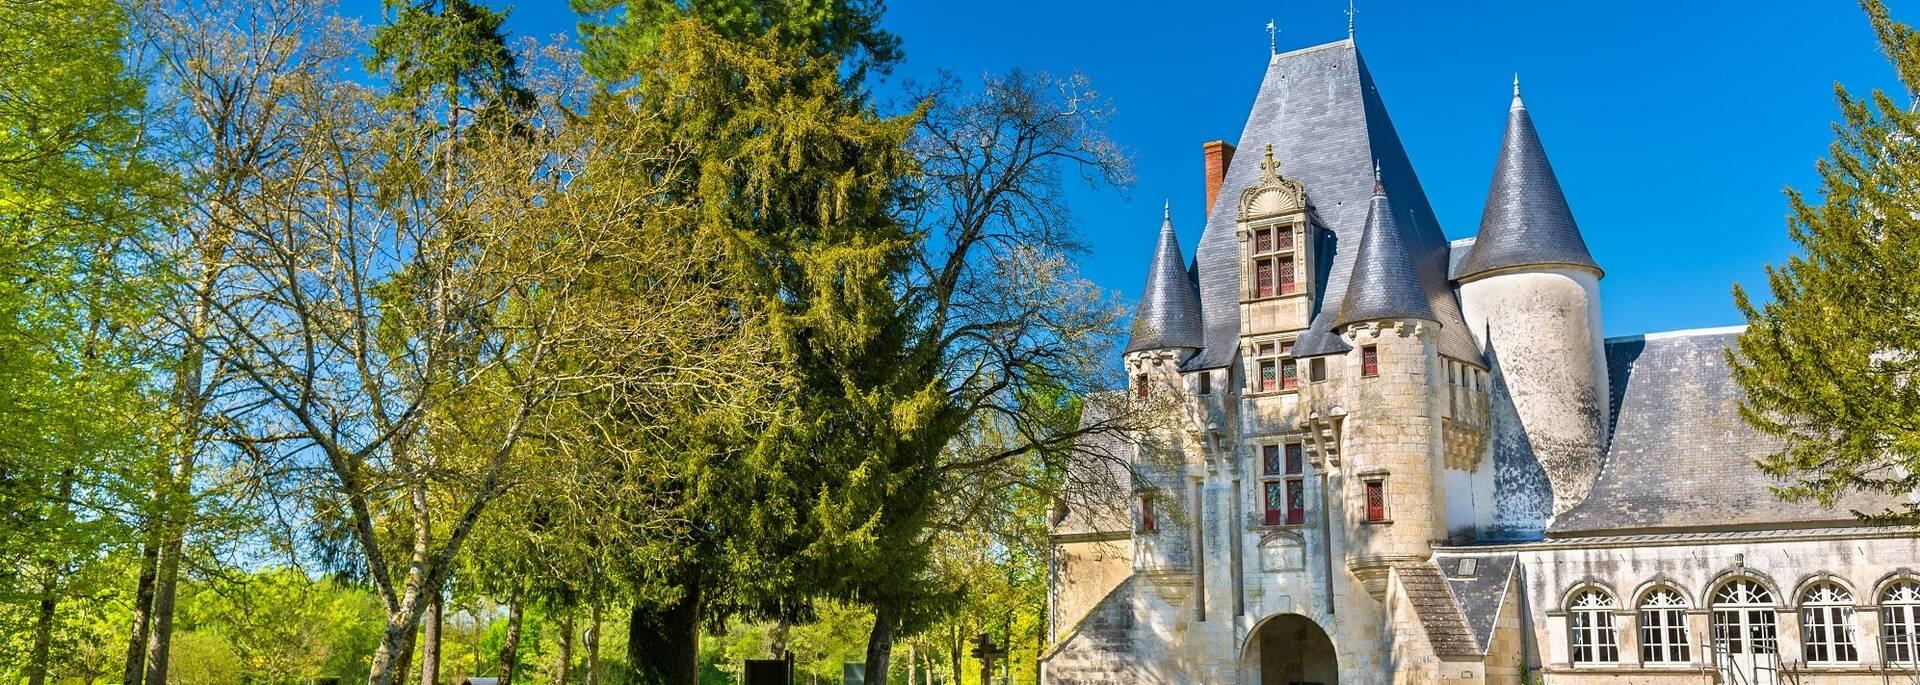 Château de Javarzay à Chef-Boutonne - ©Shutterstock